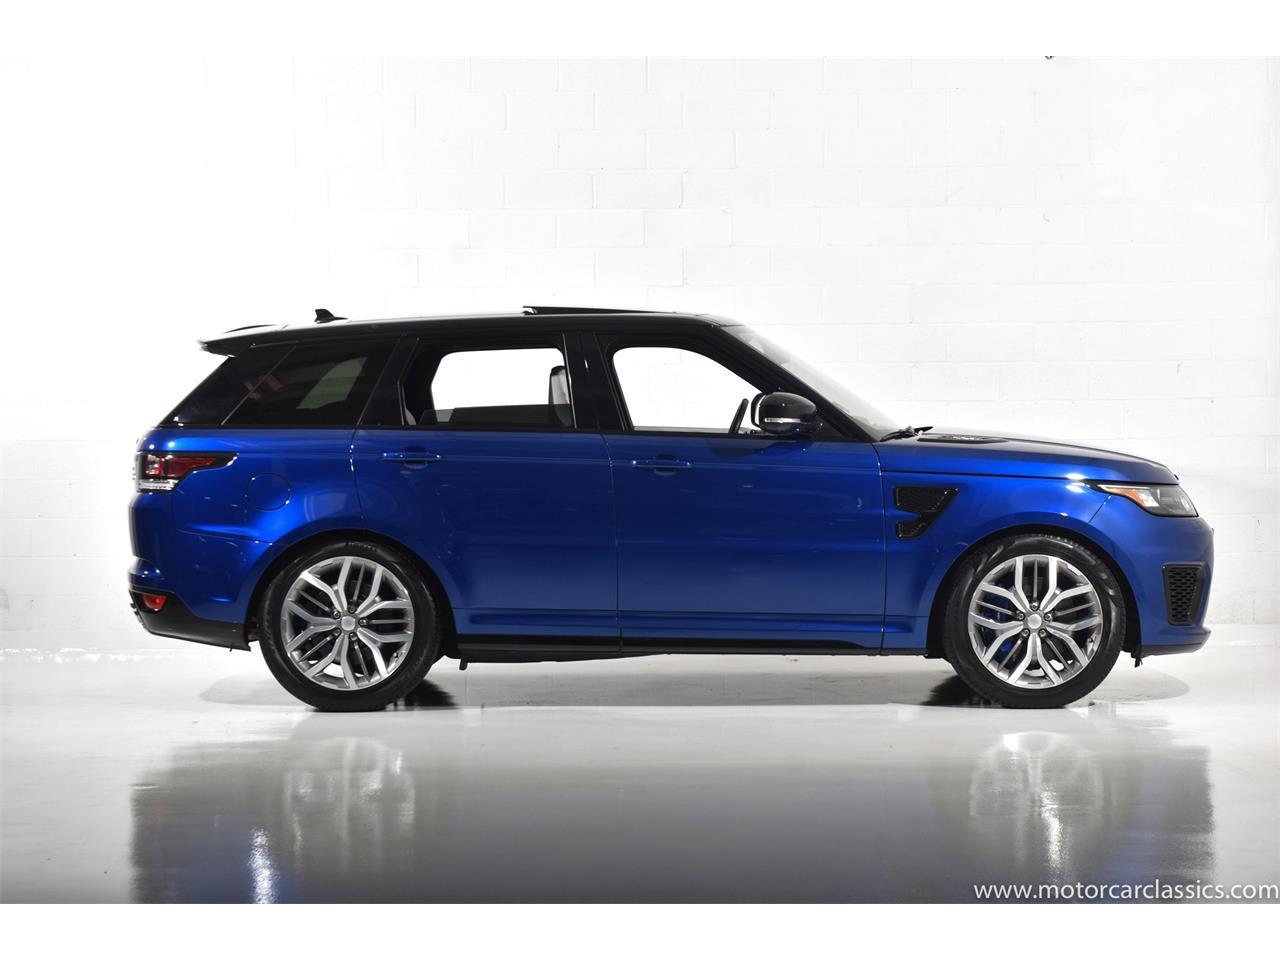 2016 Land Rover Range Rover Sport (CC-1393204) for sale in Farmingdale, New York